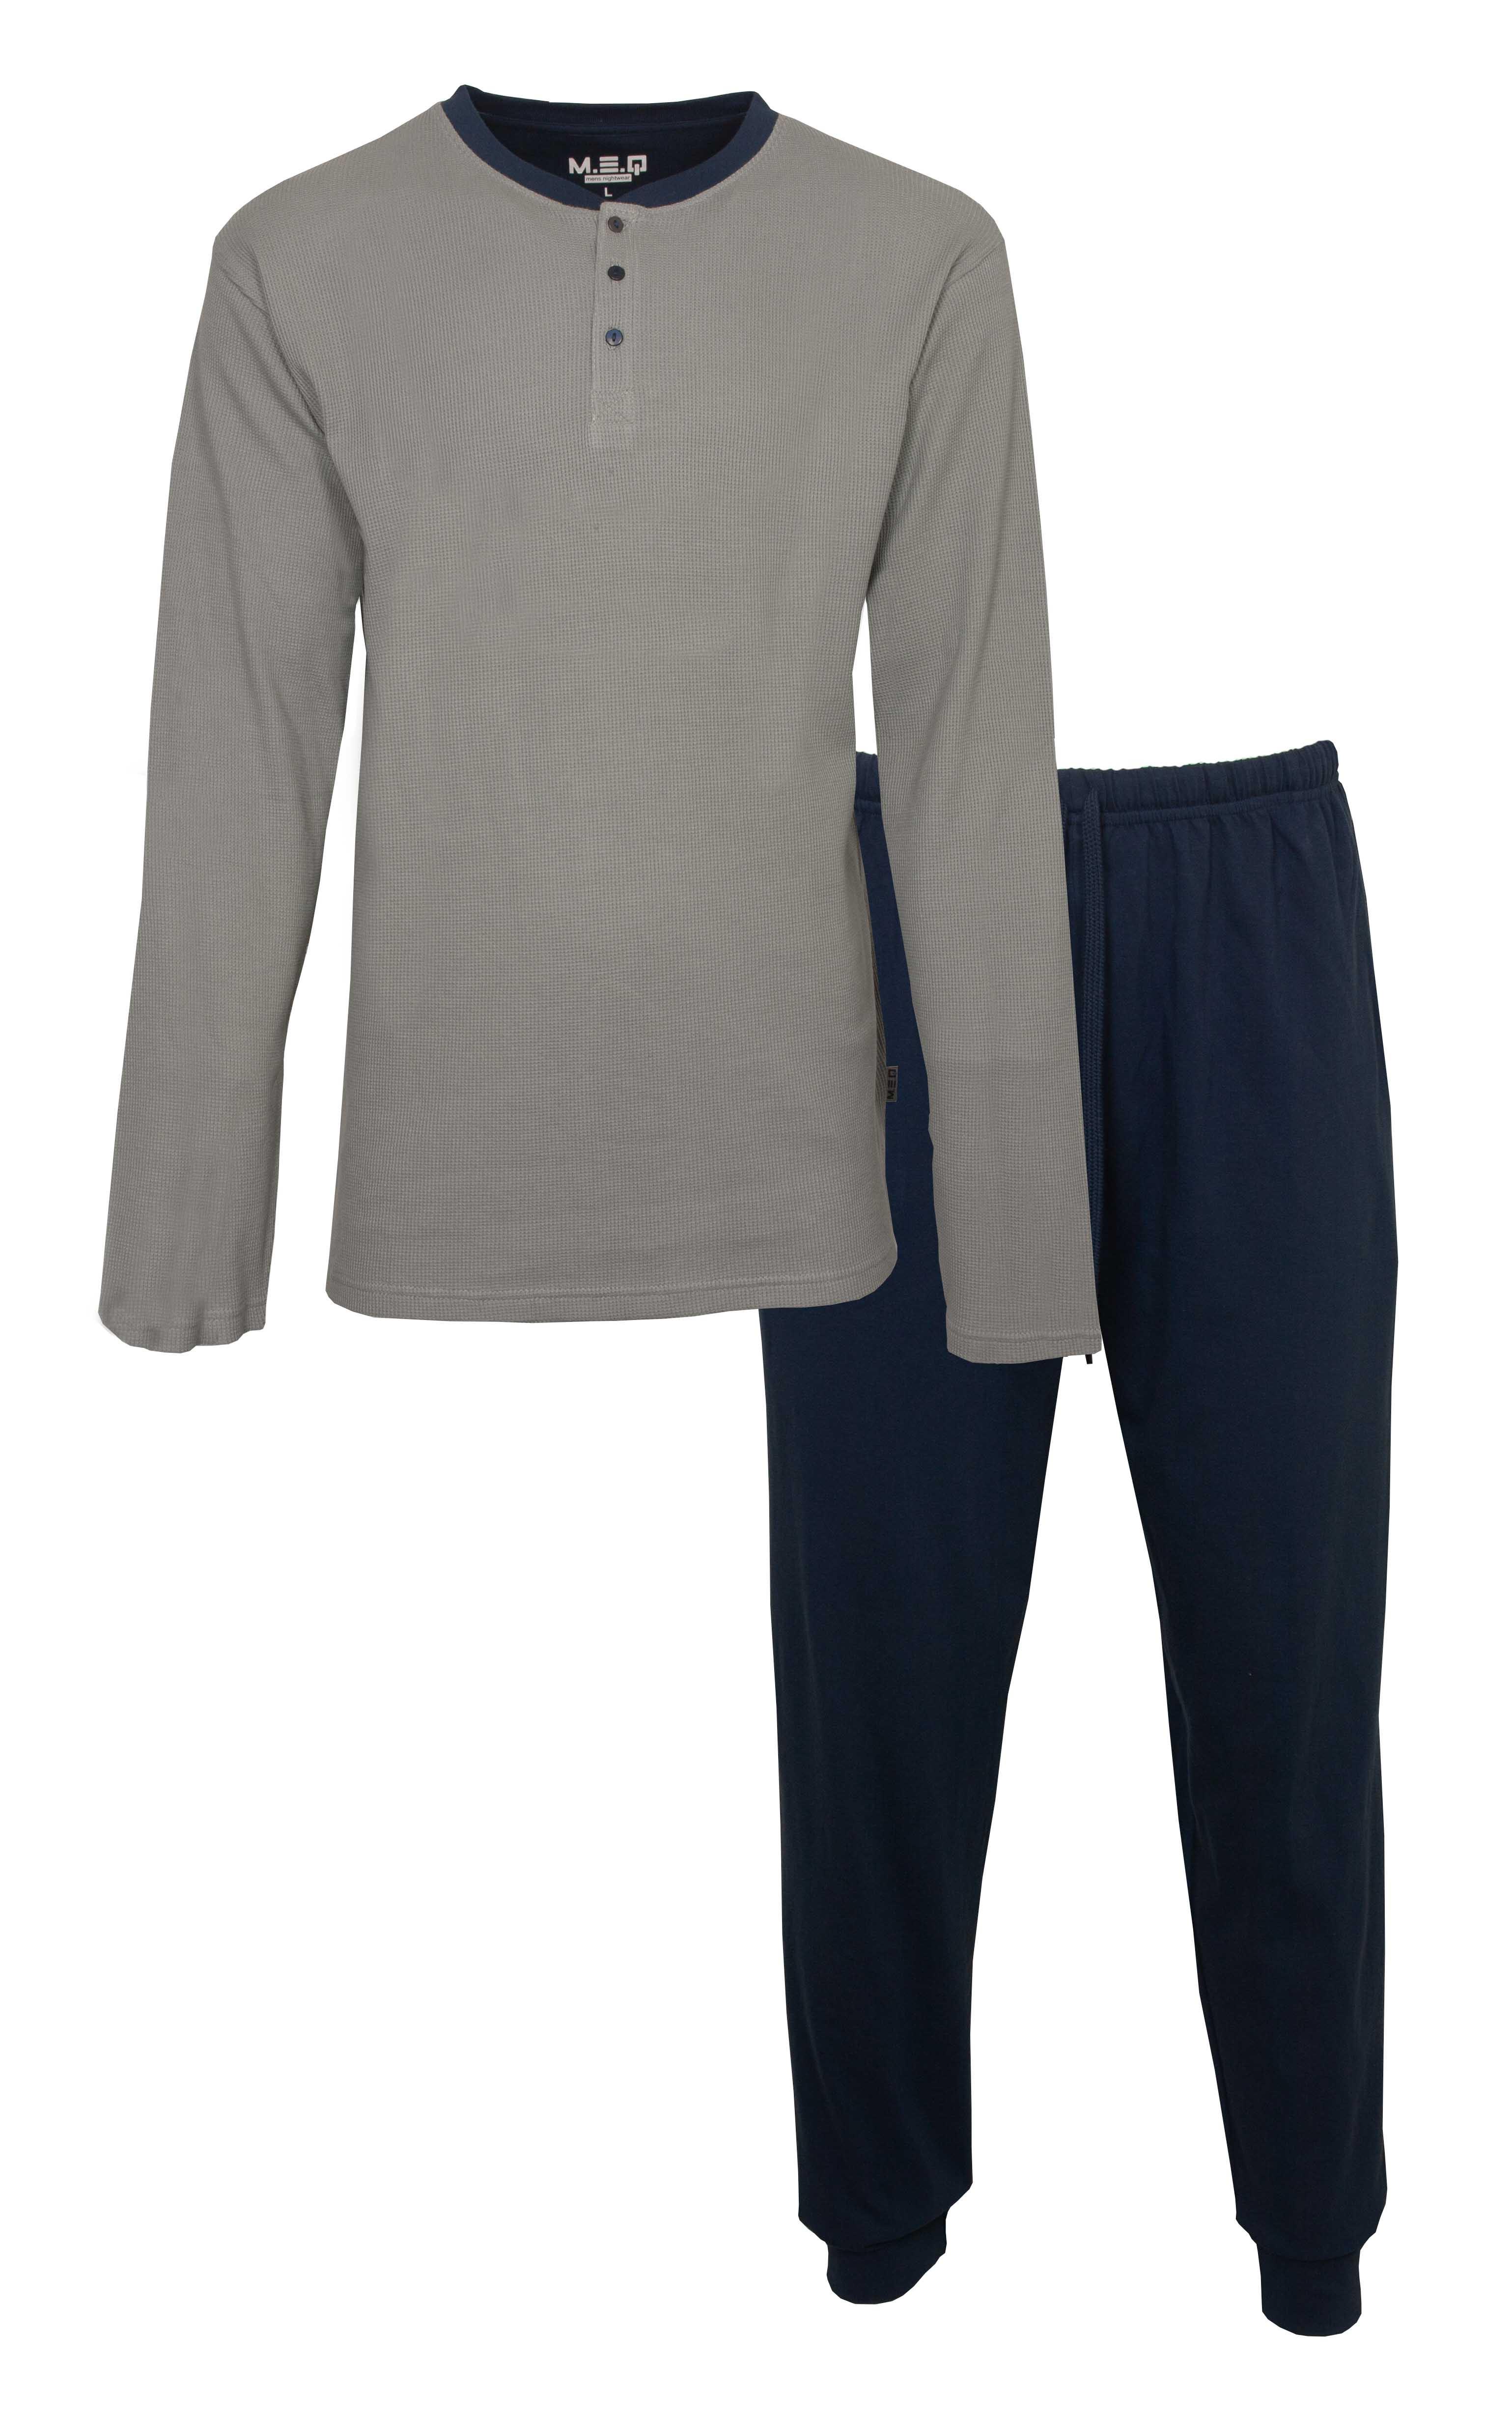 Heren pyjama MEPYH 1108B-L/52